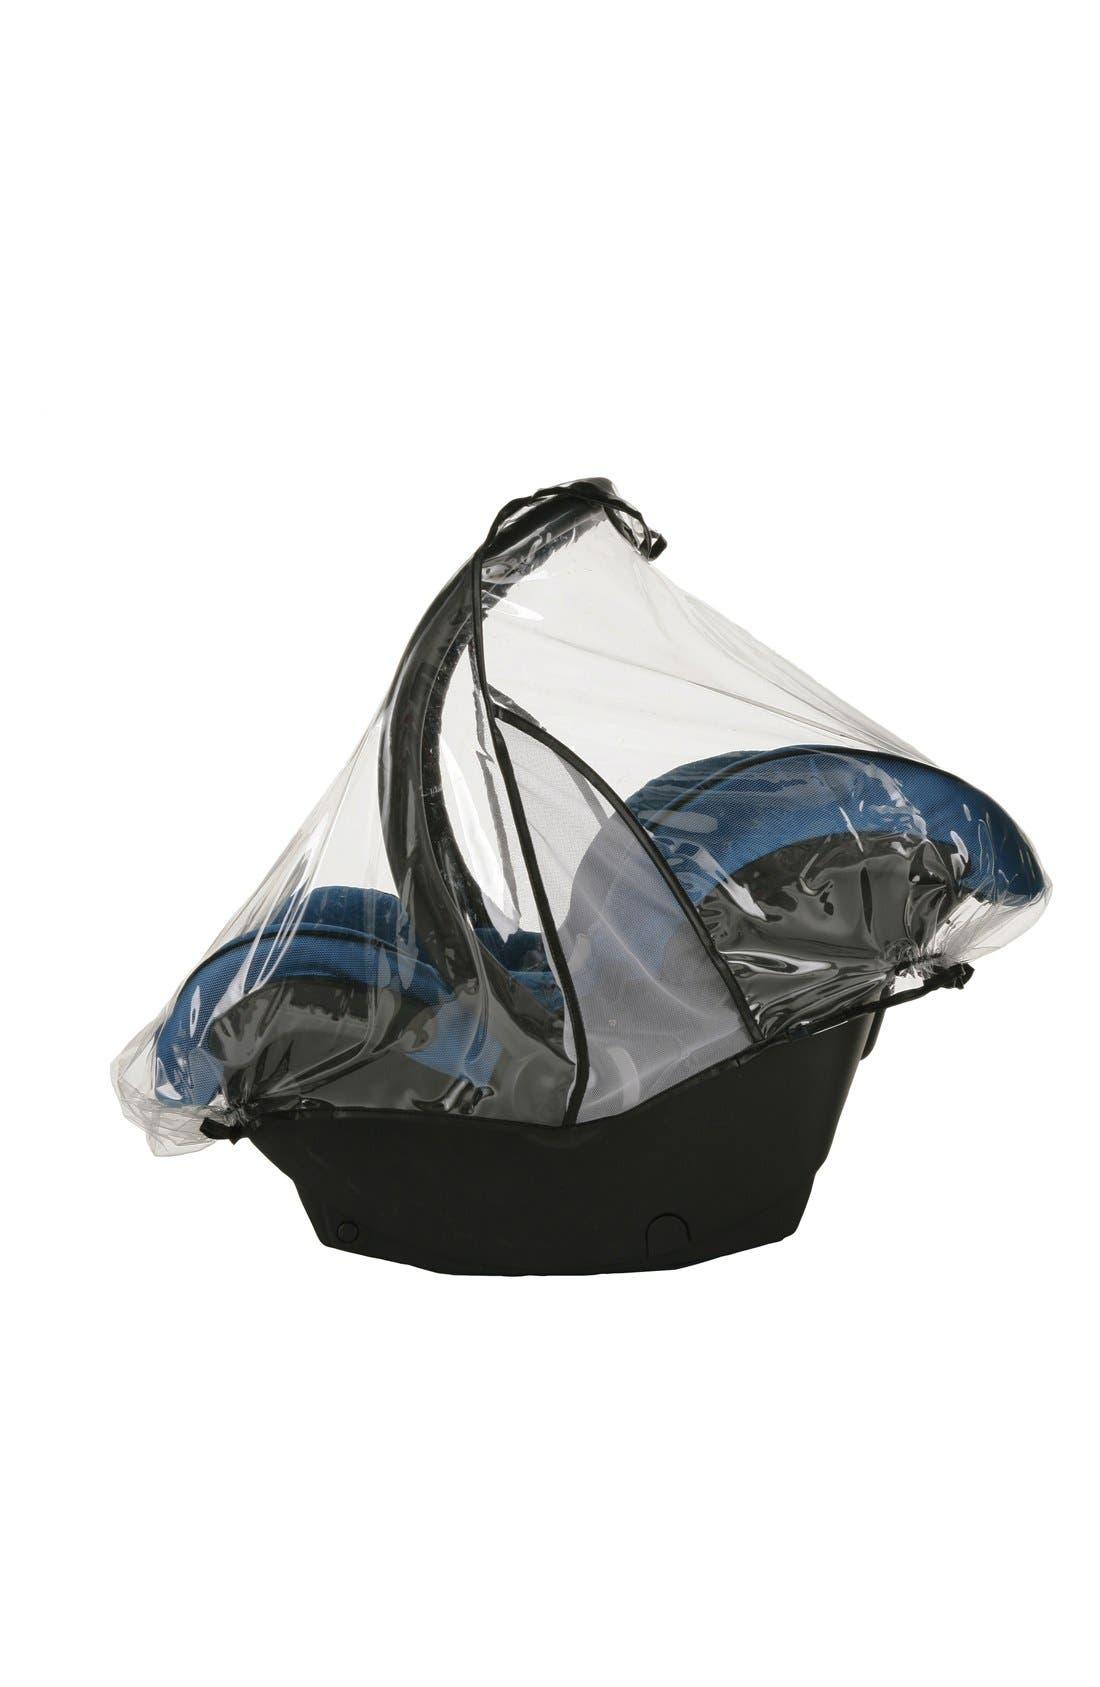 Alternate Image 1 Selected - Maxi-Cosi® Car Seat Weathershield